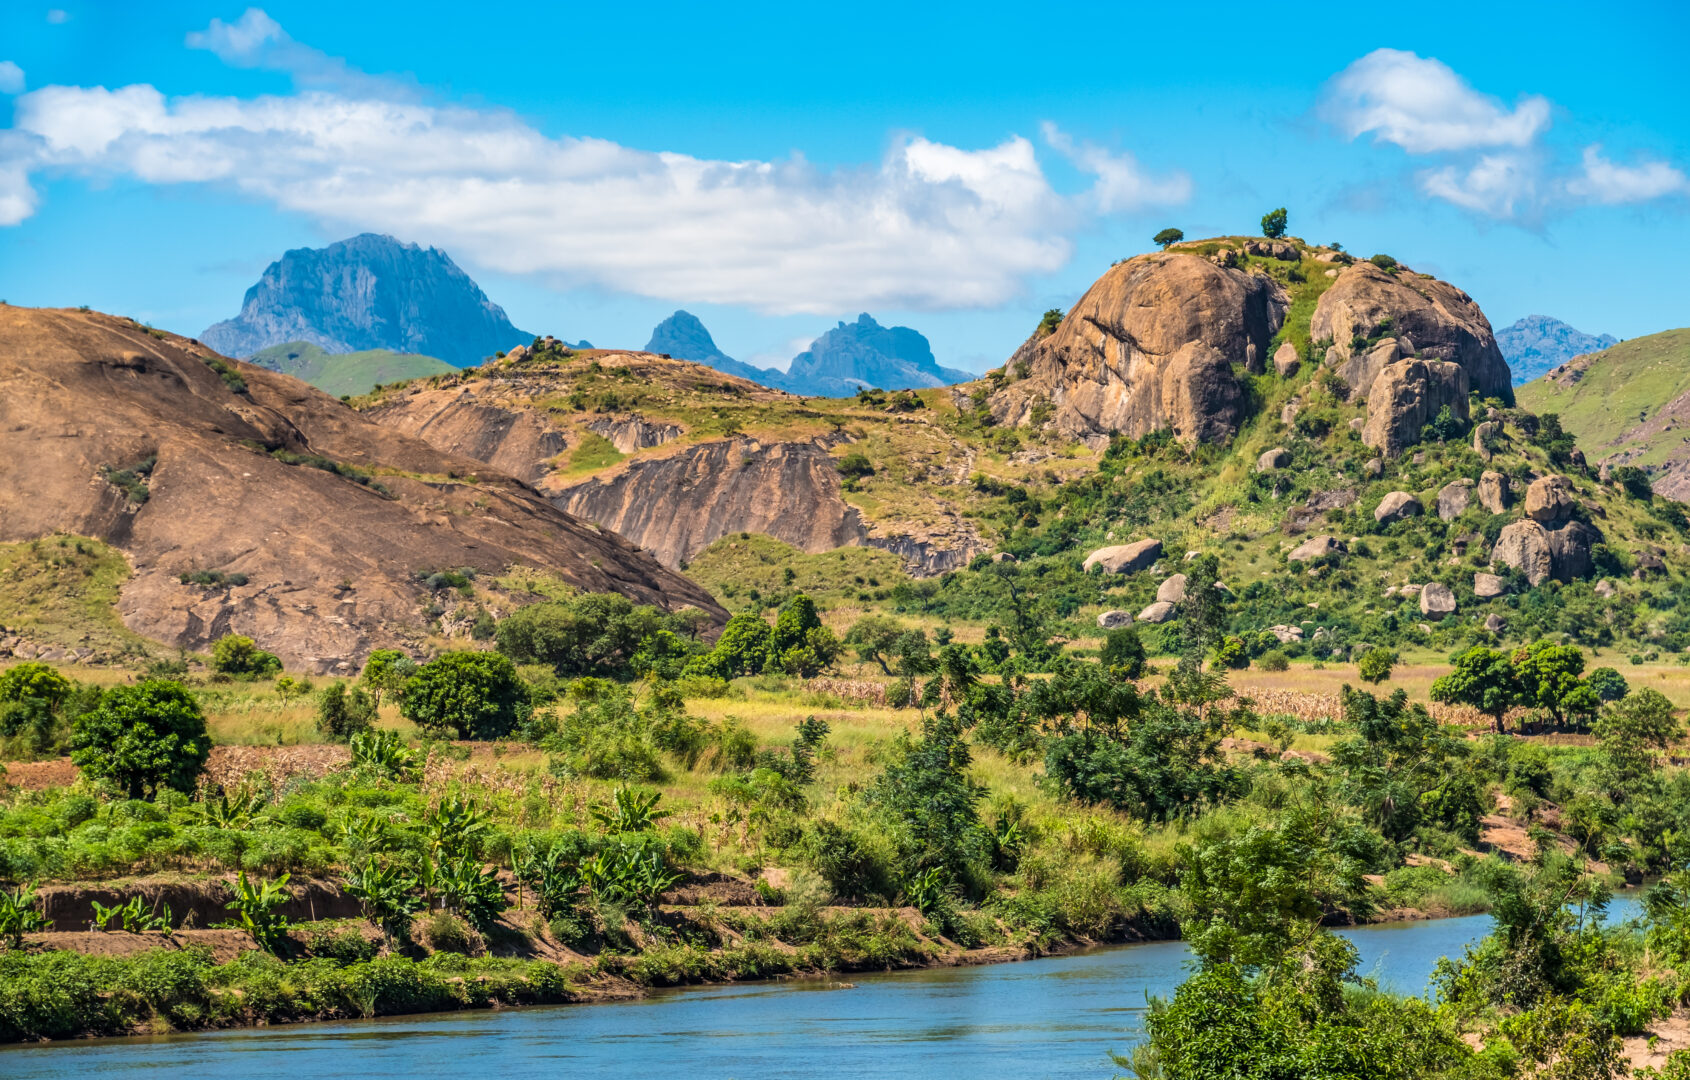 Mesmerizing landscapes along the National Route 7 between Ambalavao and Isalo, Madagascar